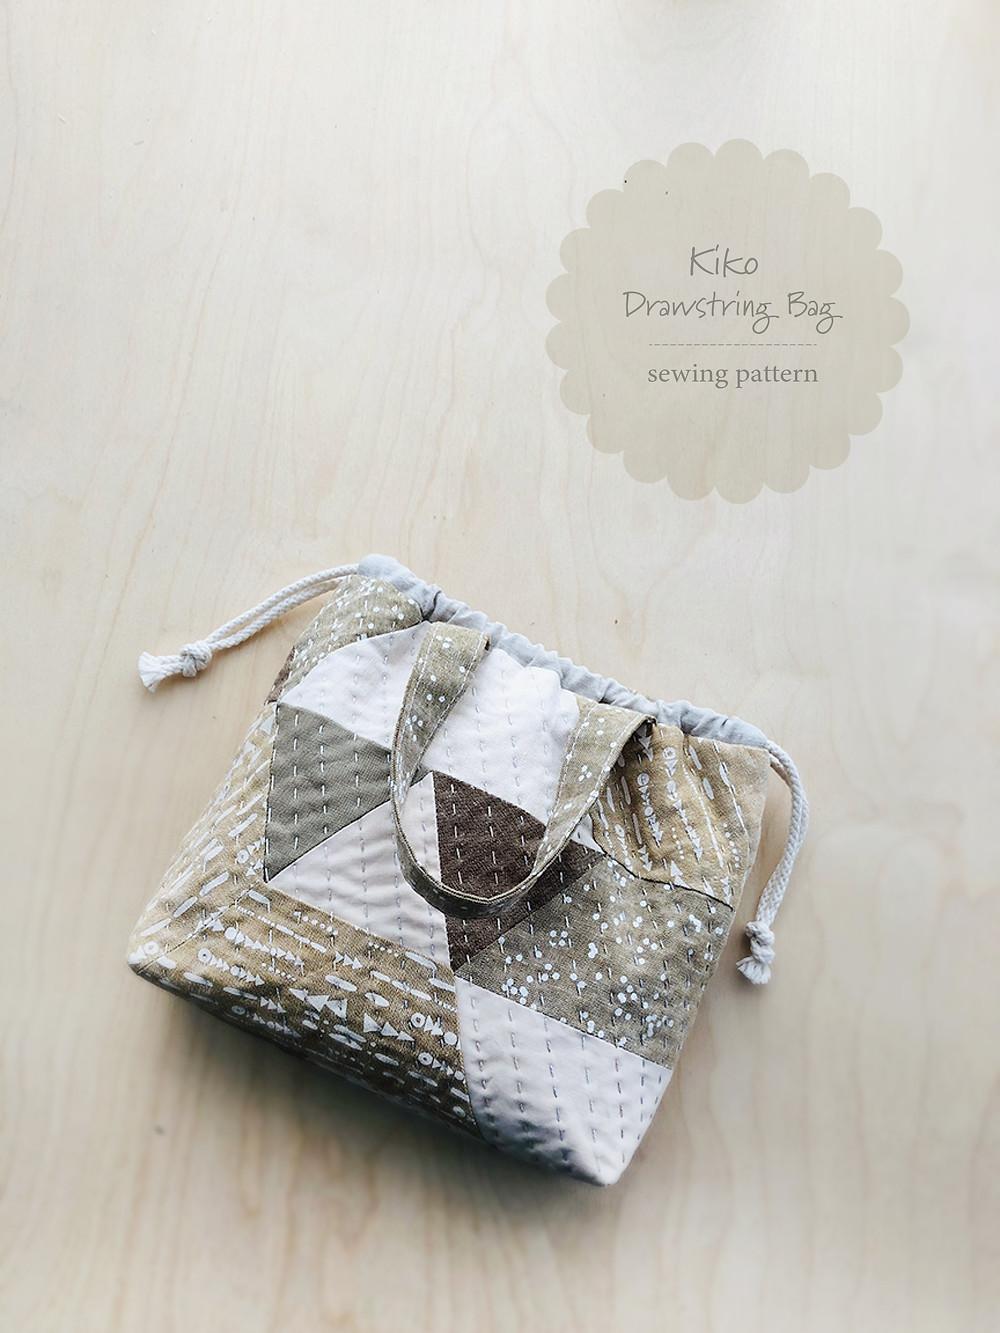 Kiko Drawstring Bag